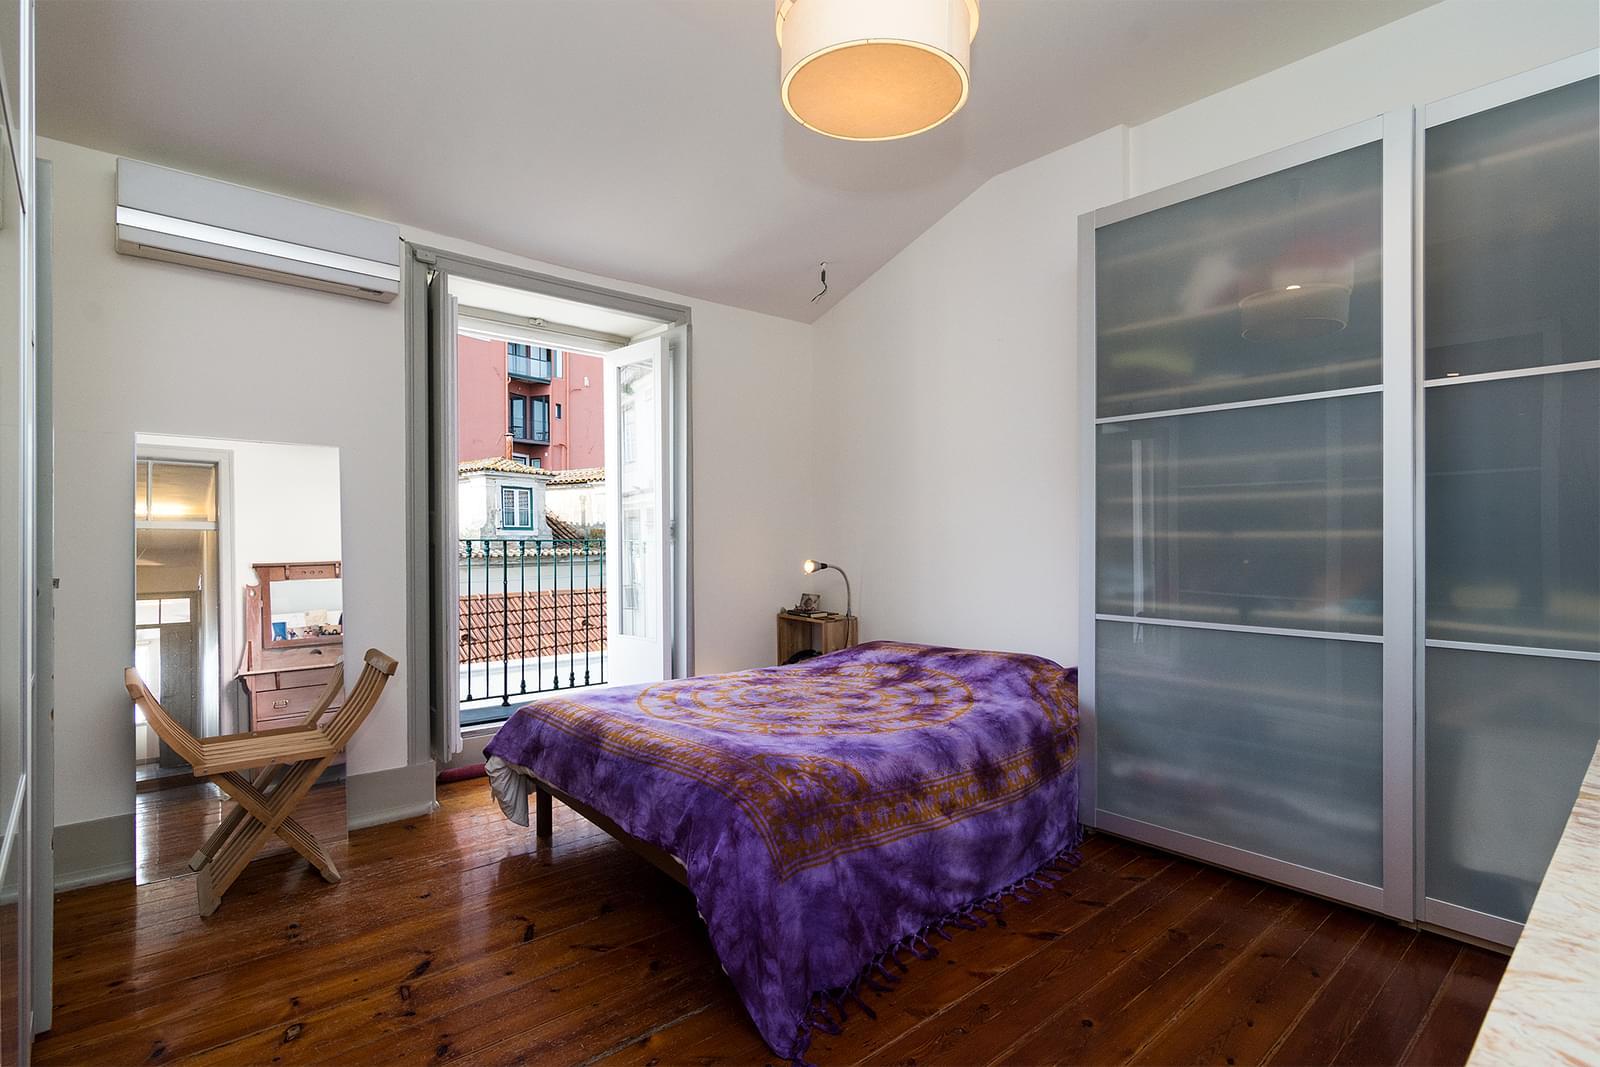 pf17052-apartamento-t3-lisboa-eb0a7274-eb60-446b-a6ff-bae7757a576a